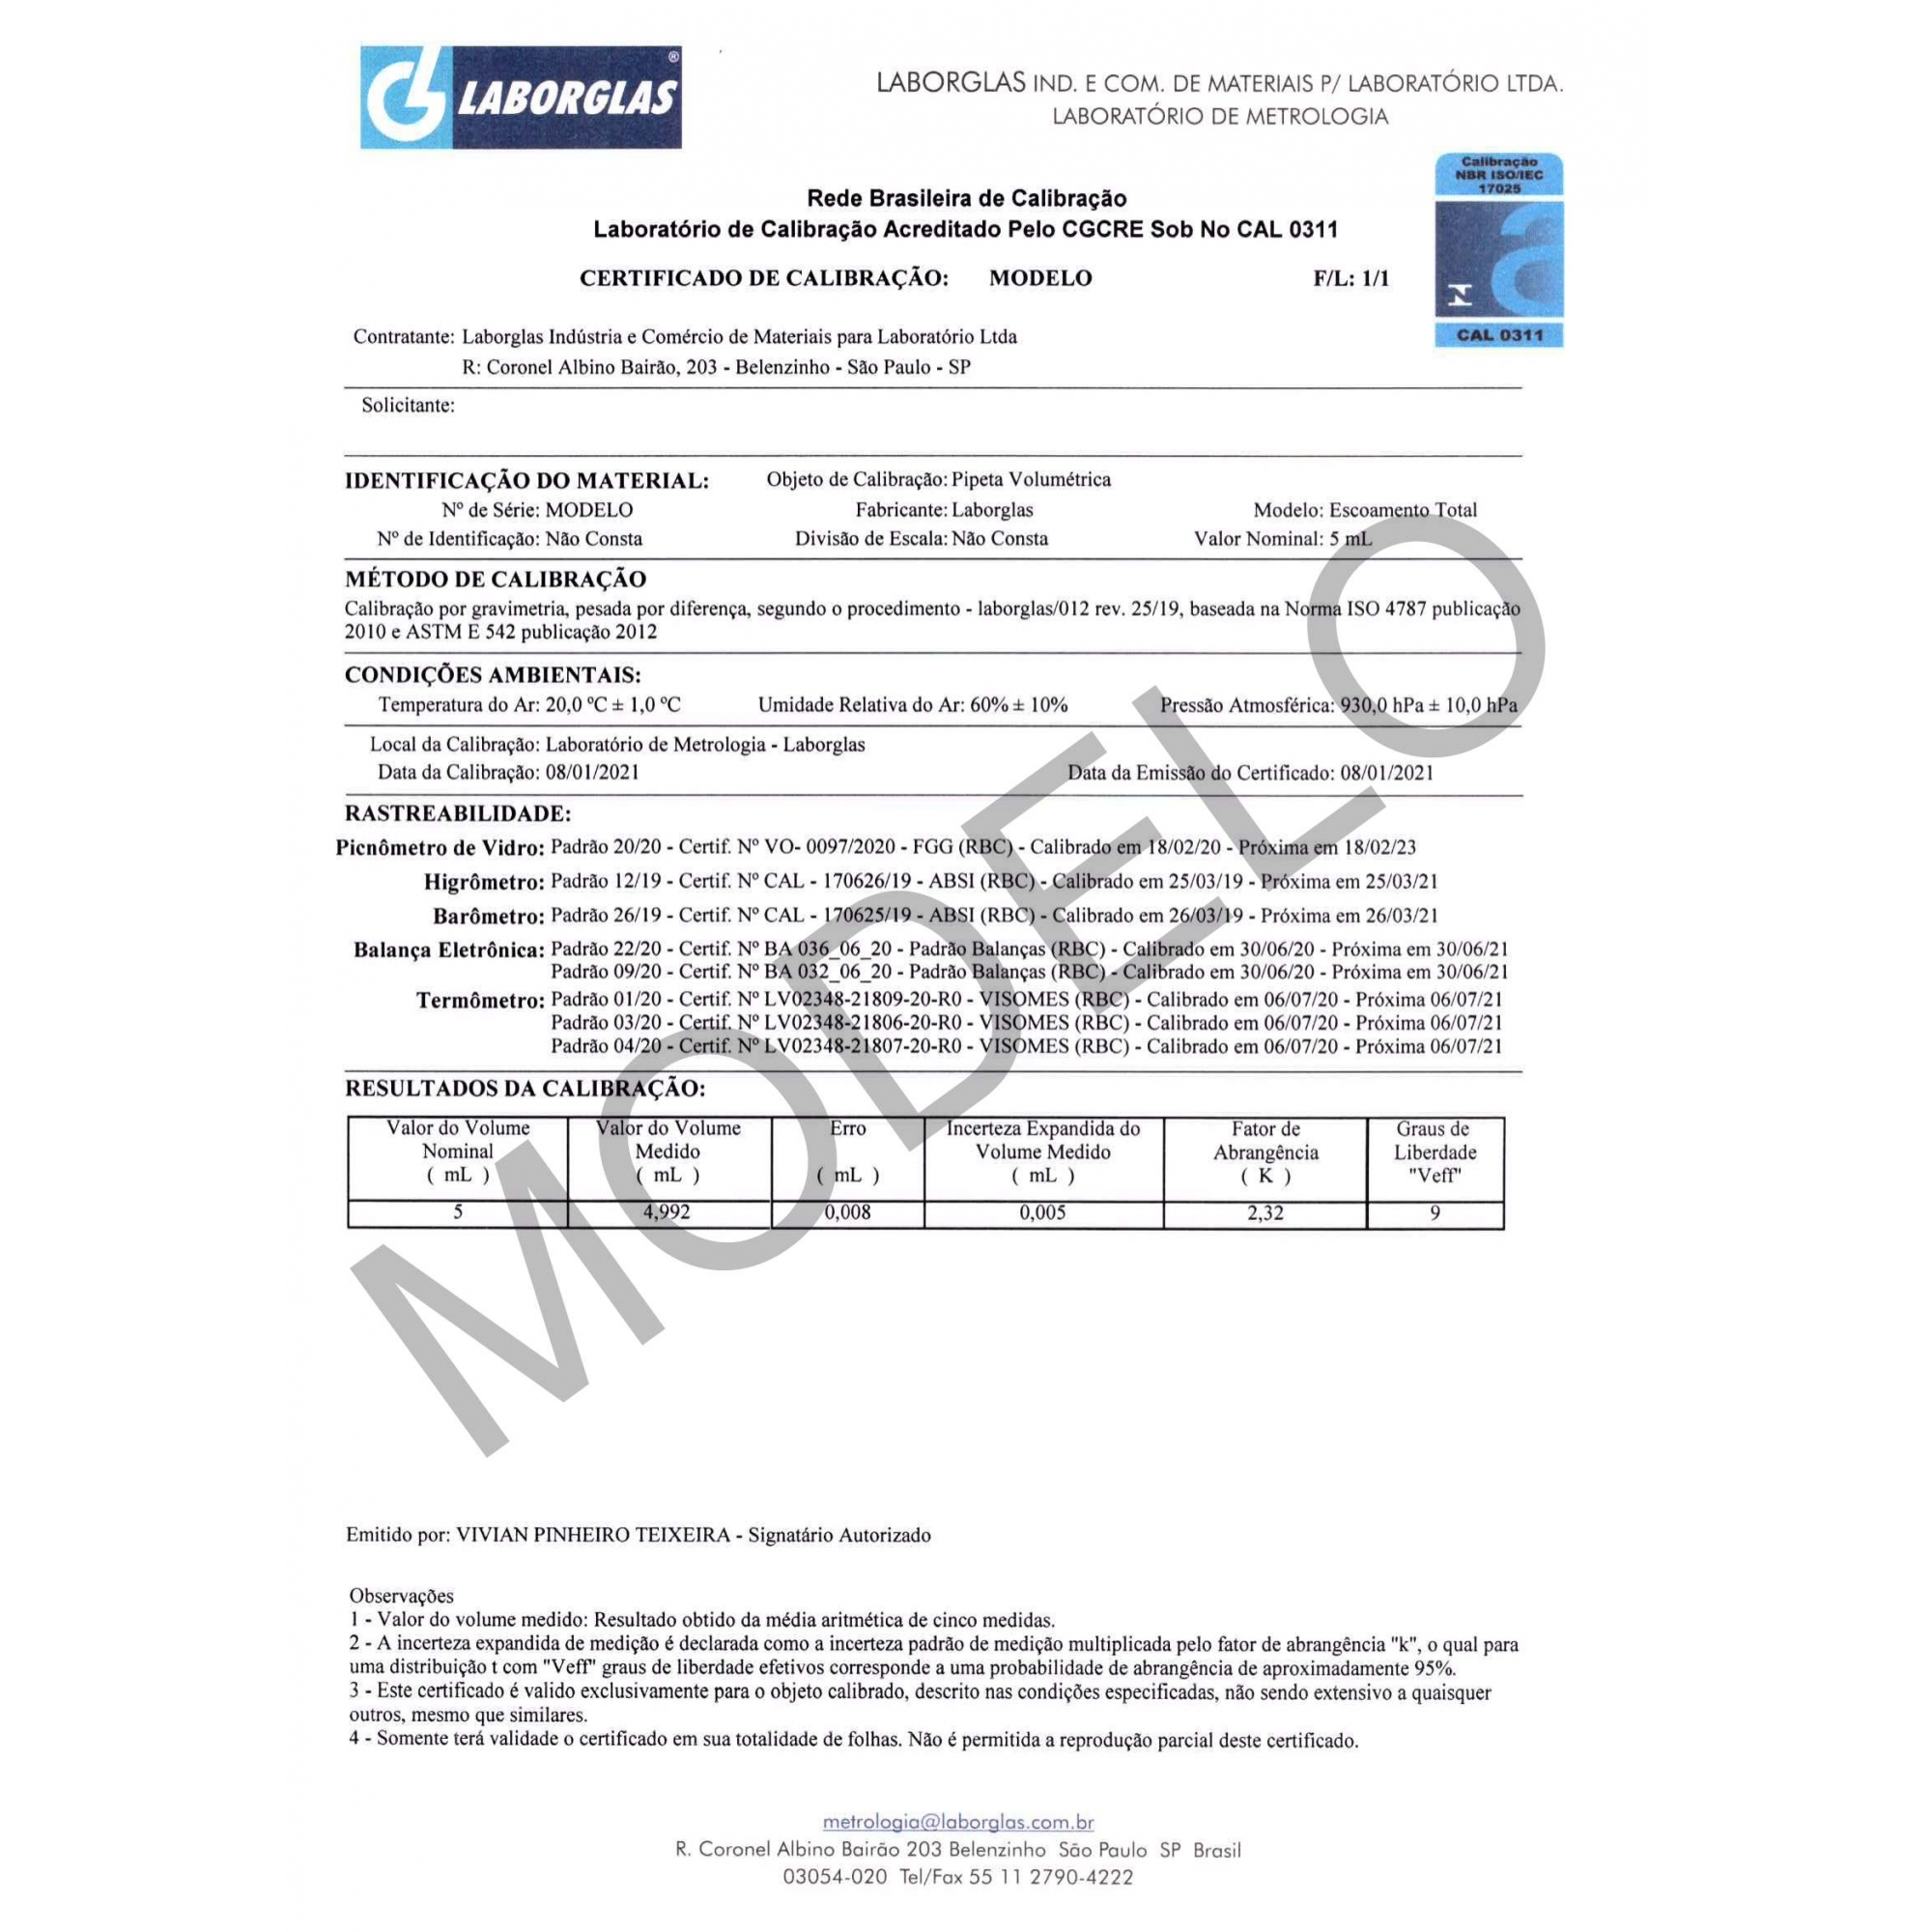 PIPETA VOLUMÉTRICA ESGOTAMENTO TOTAL 10 ML CERTIFICADO RBC - Laborglas - Cód. 9433711-R